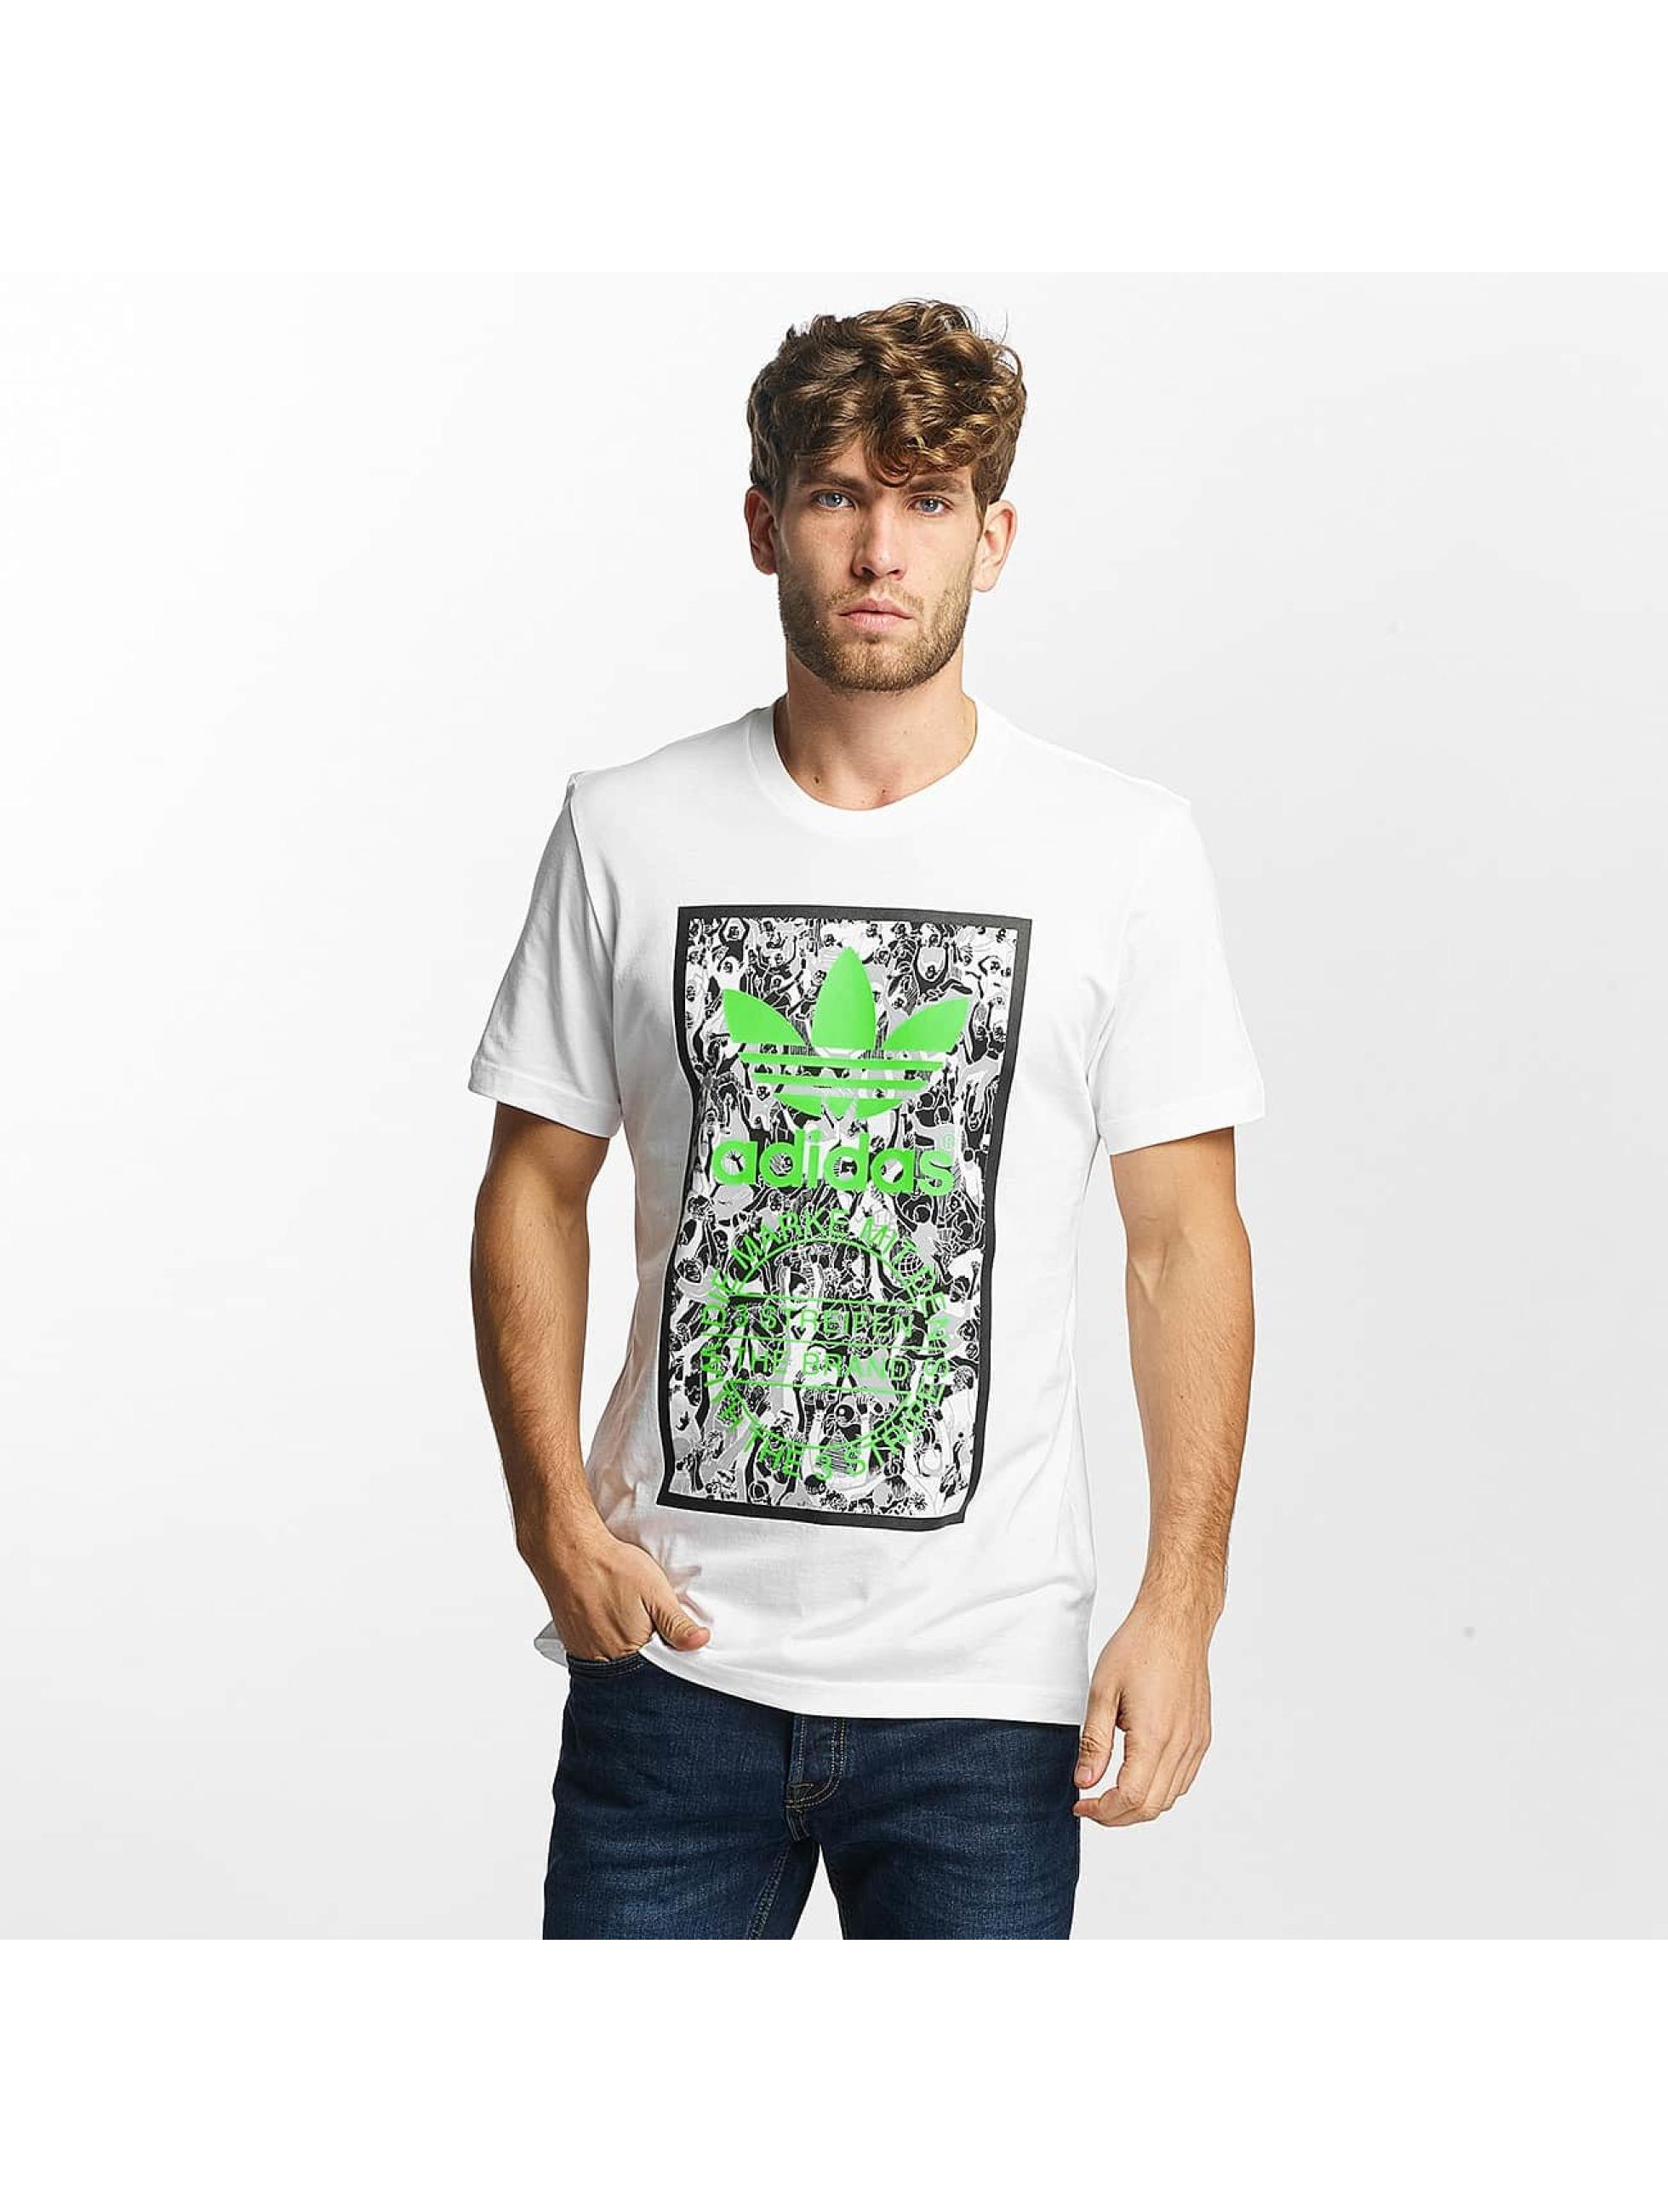 adidas T-Shirt Tongue Label 1 white